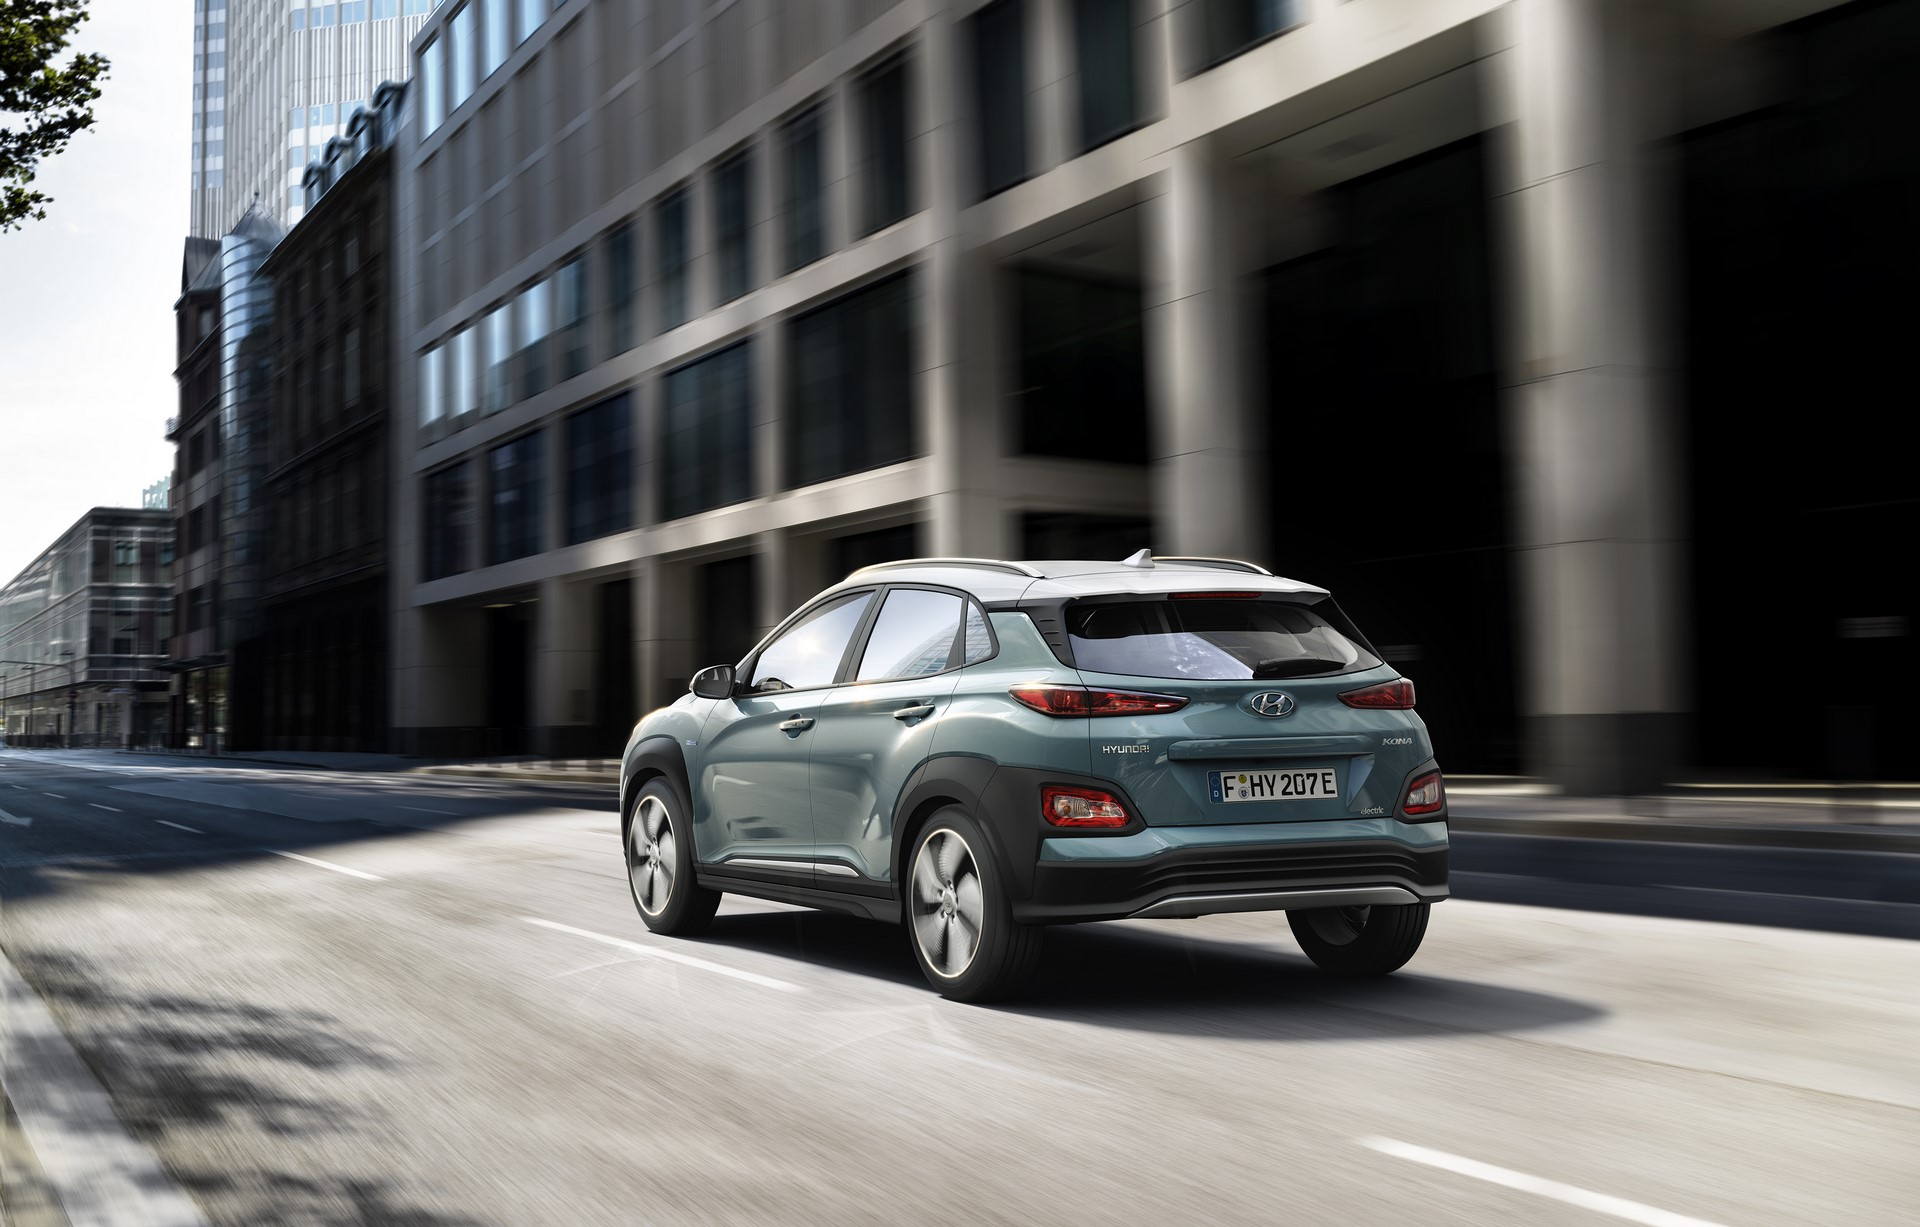 Hyundai Kona Electric 2018 (4)